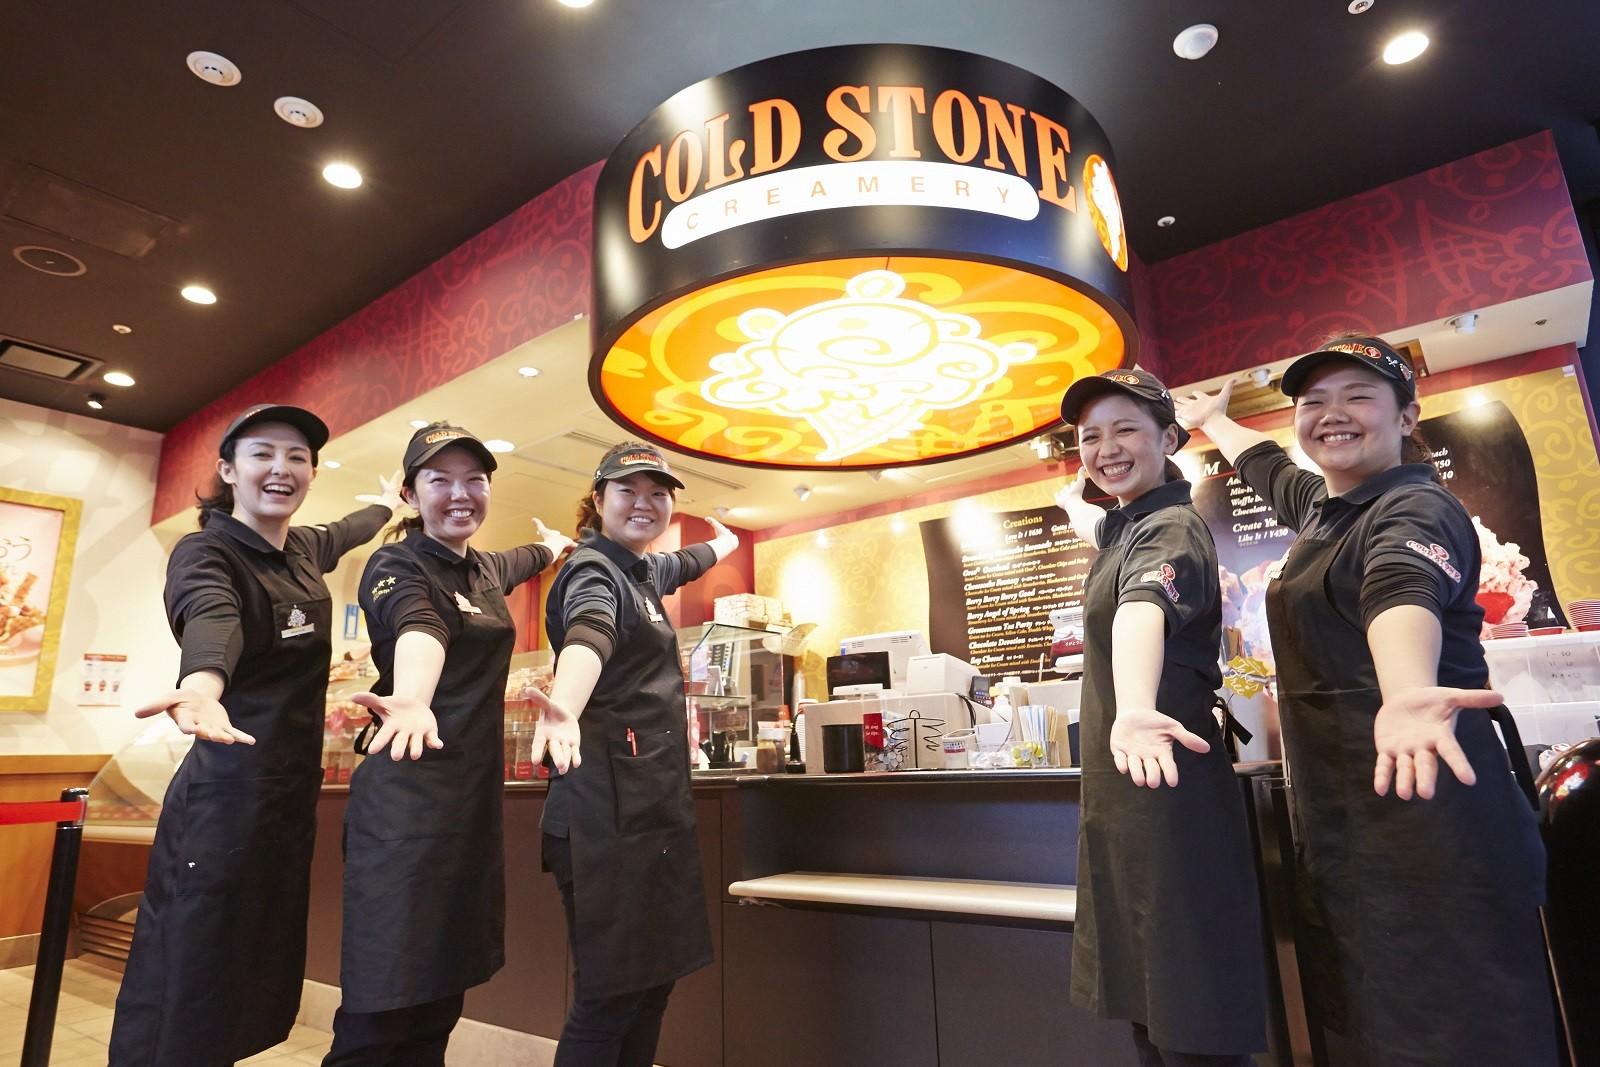 COLD STONE CREAMERY(コールドストーンクリーマリー) 越谷イオンレイクタウン店のアルバイト情報